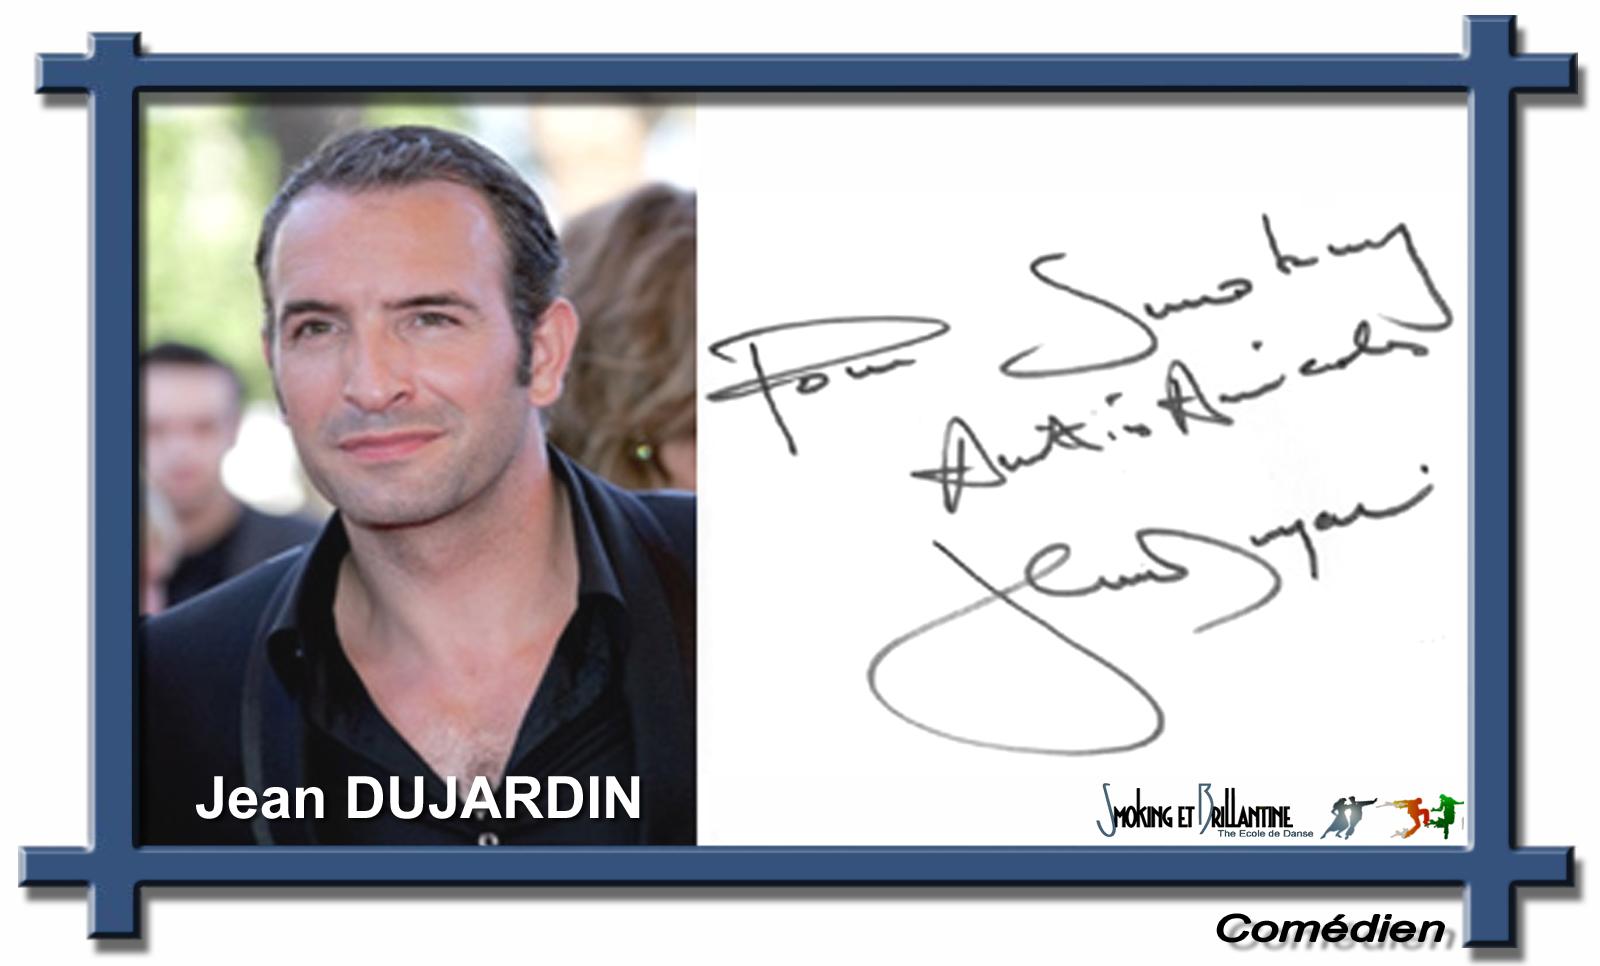 Jean dujardin smoking et brillantine for Contacter jean dujardin